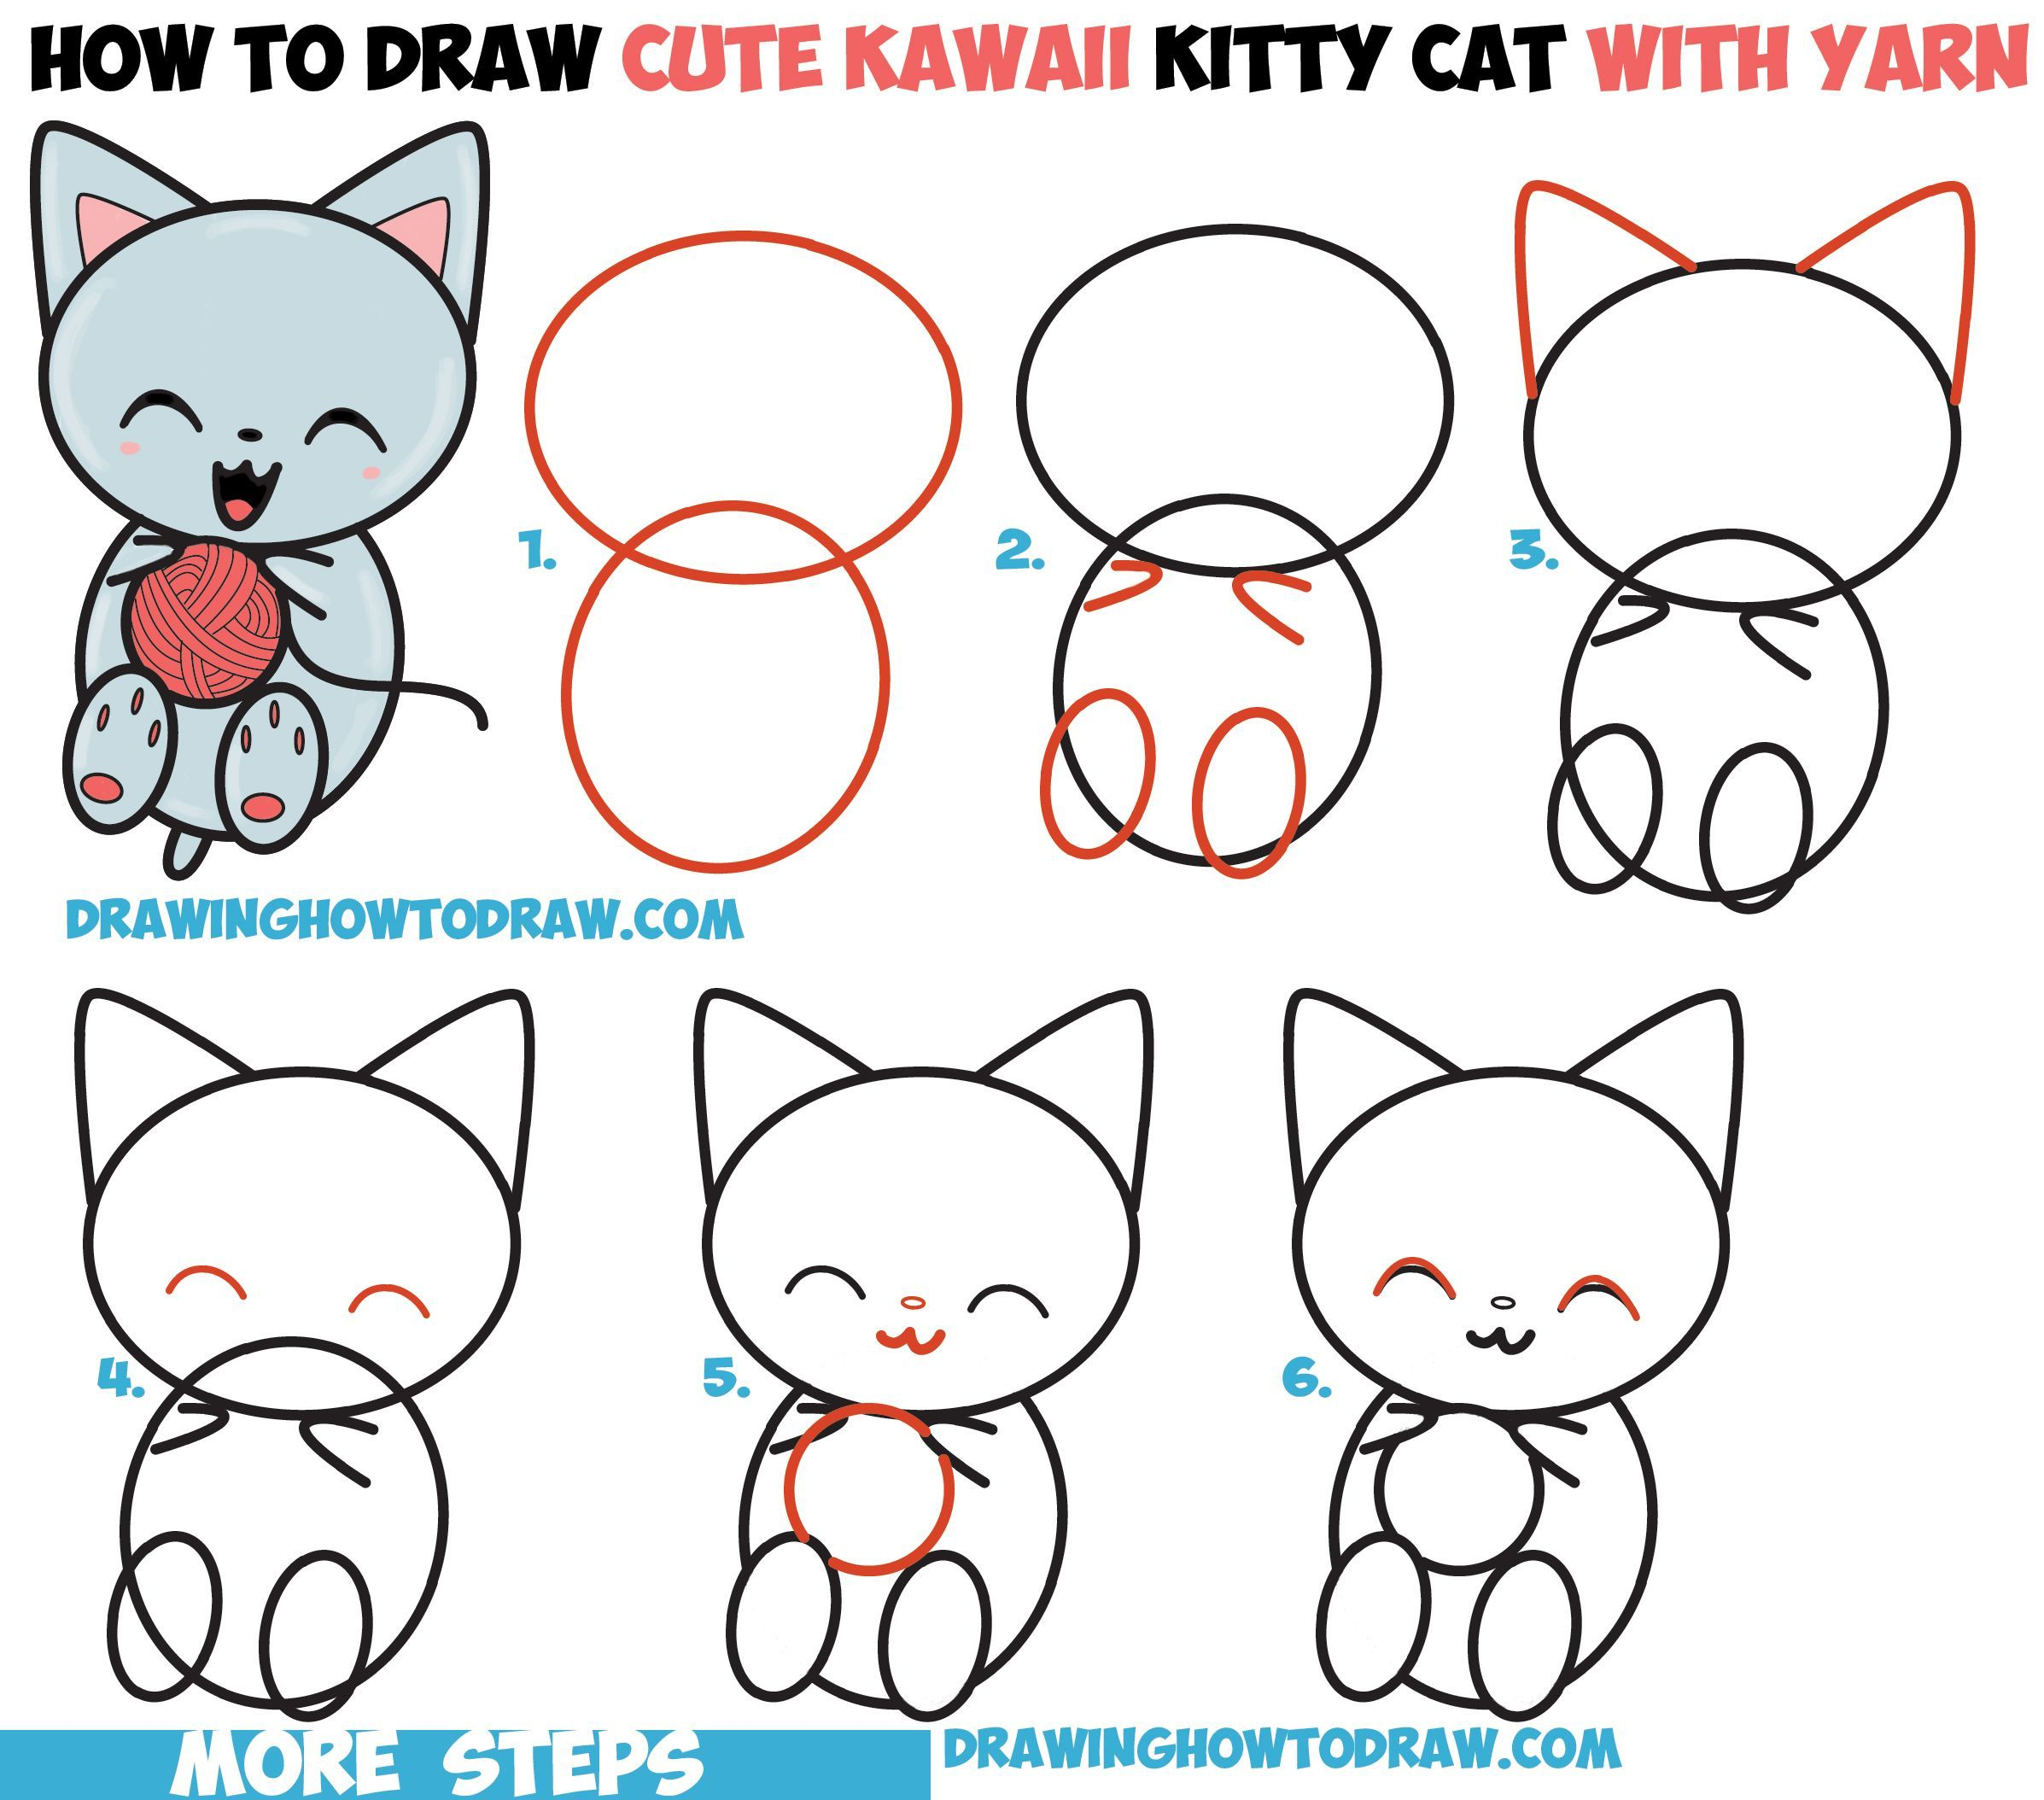 How to Draw Cute Kawaii Kitten / Cat Playing with Yarn ...